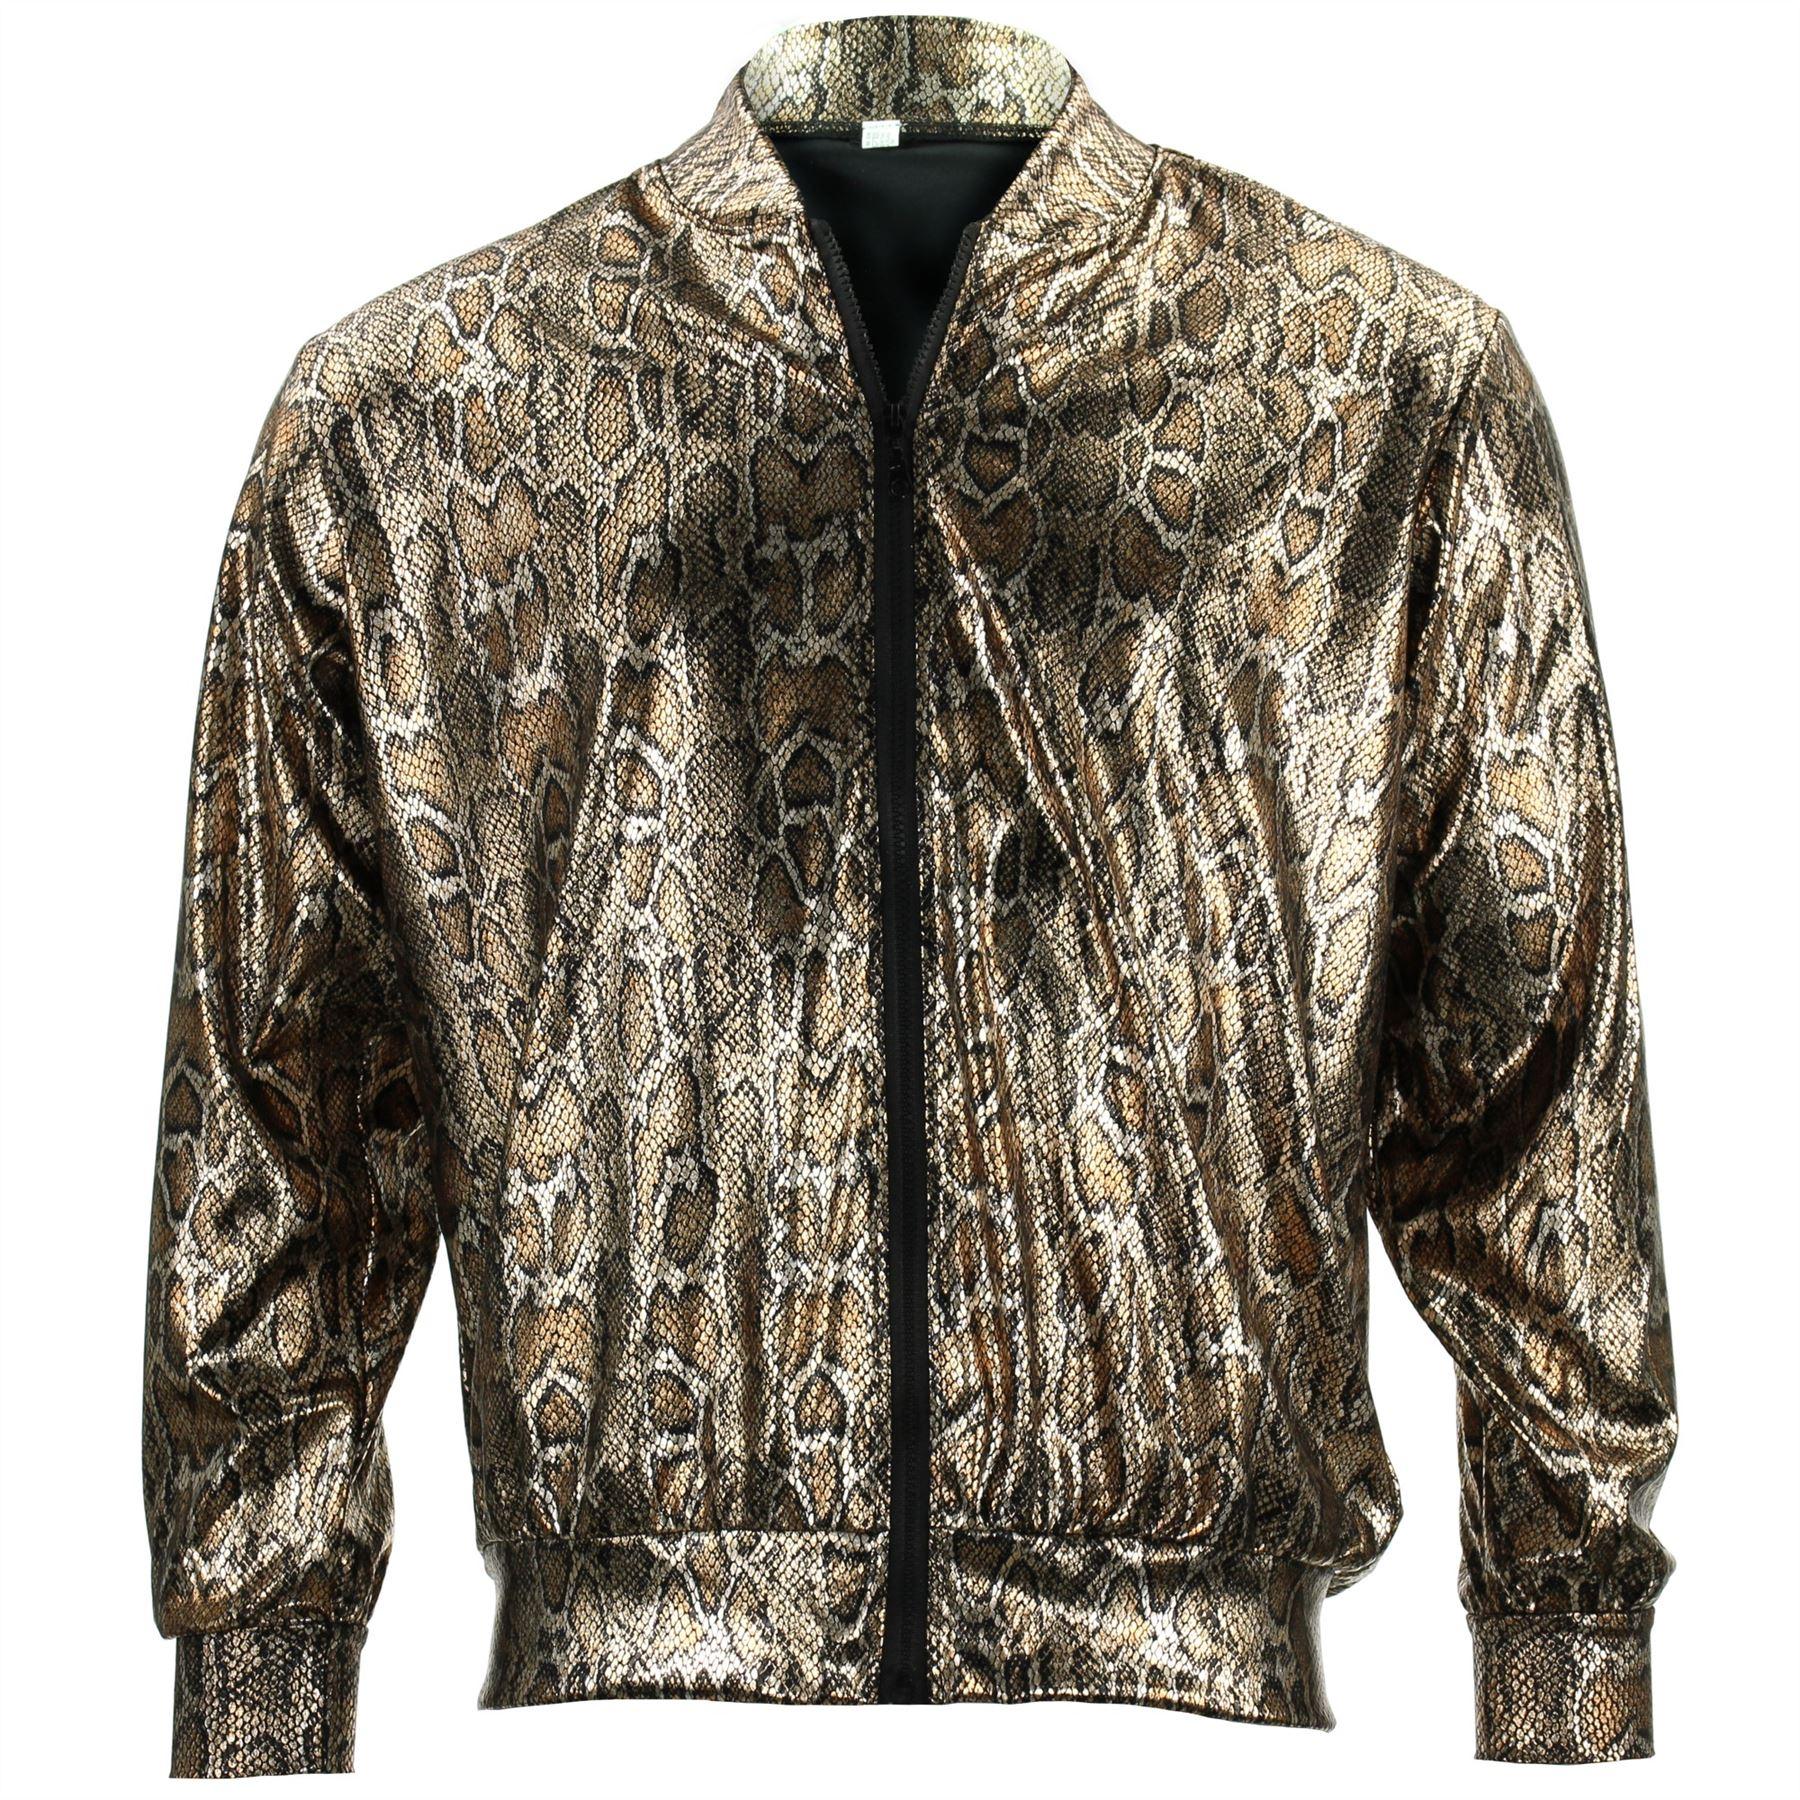 Bomber-Jacket-Shiny-Unisex-Ladies-Men-FIREFLY-Sparkly-GOLD-SILVER-RAINBOW-PURPLE thumbnail 22